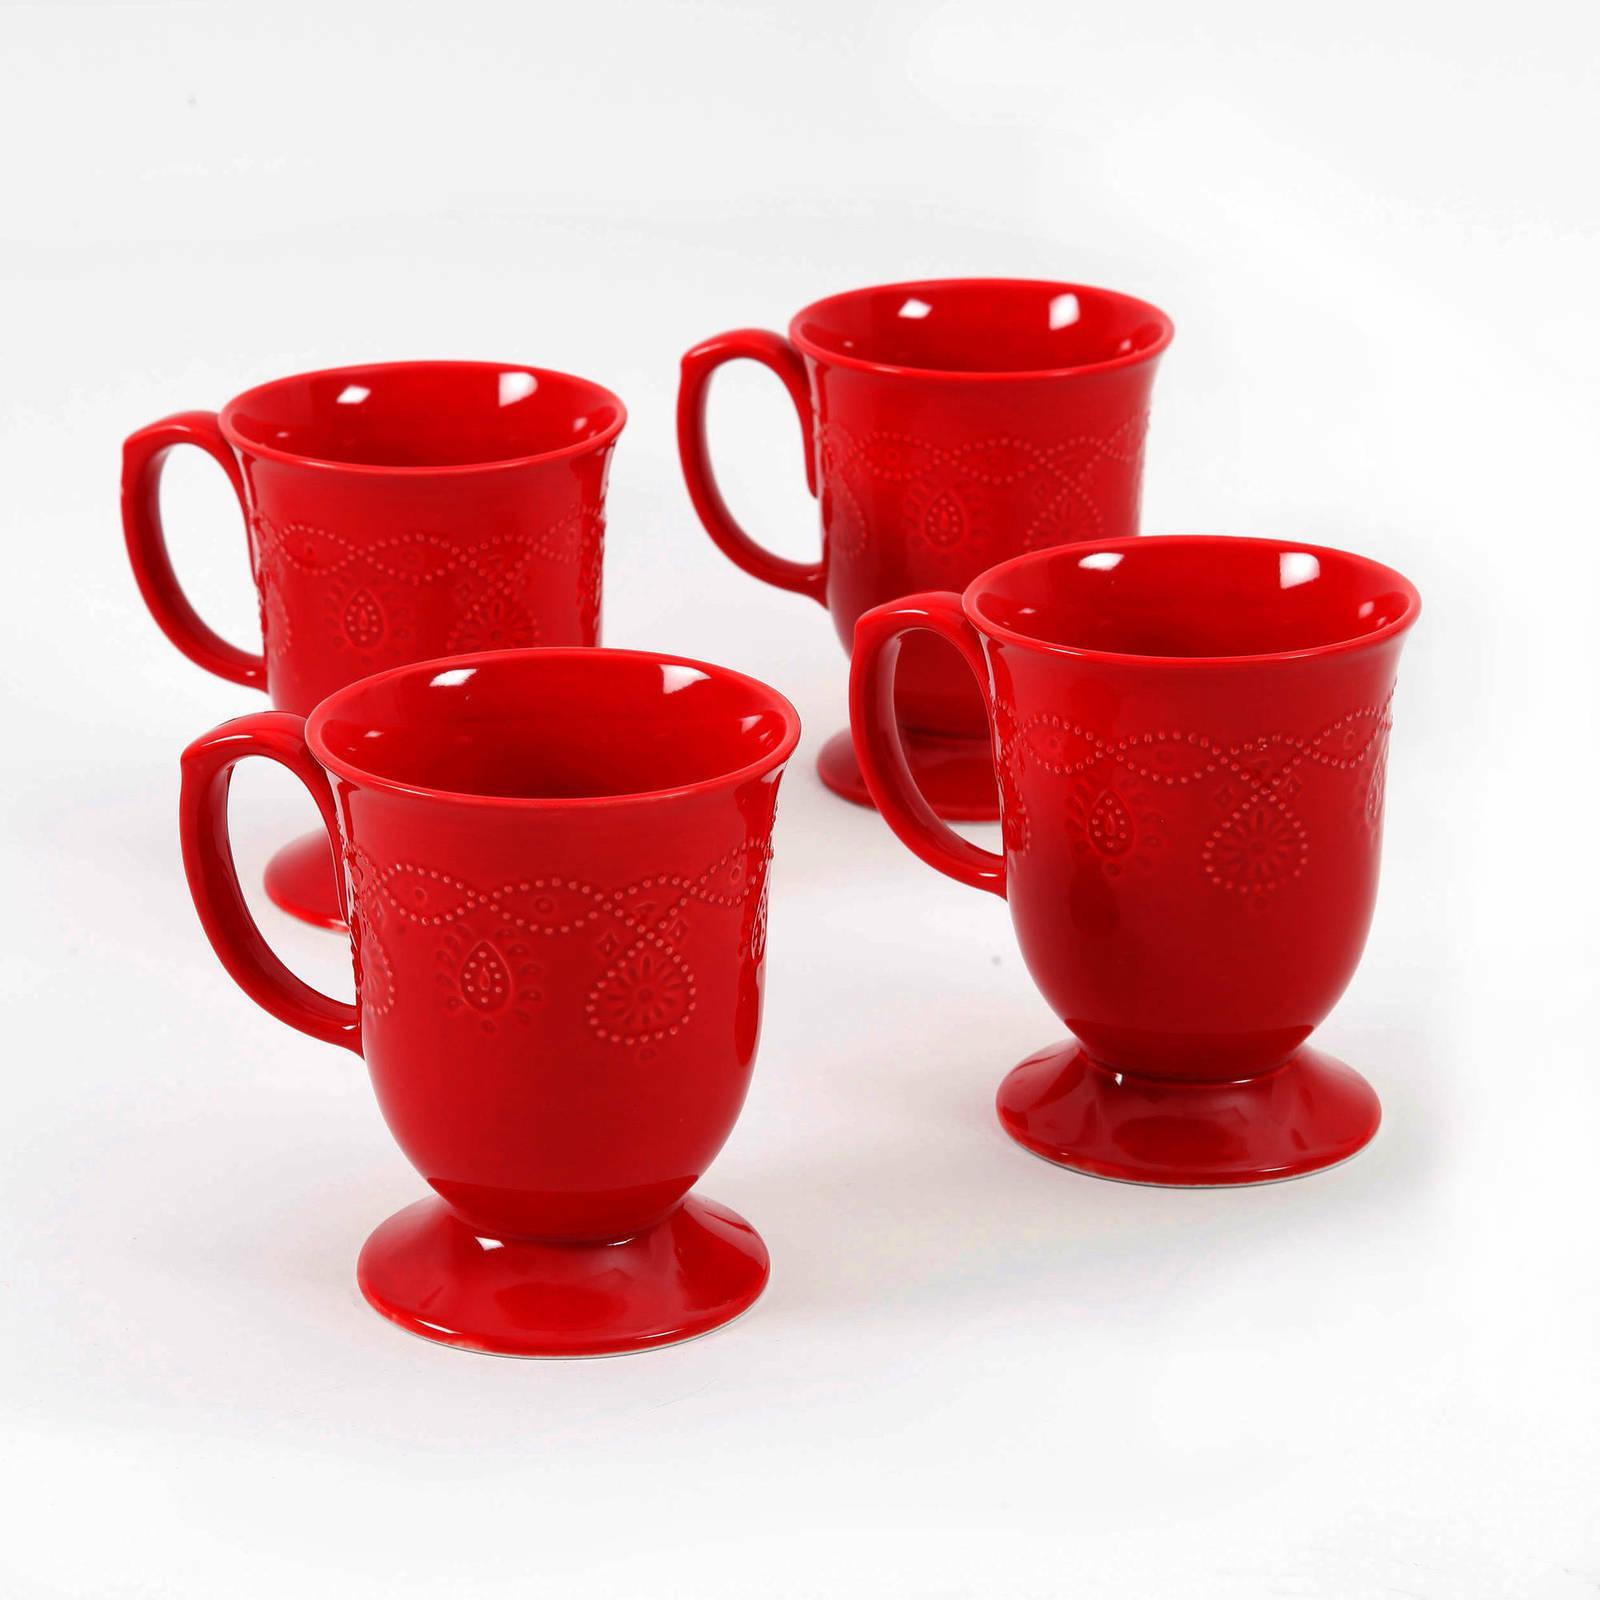 red coffee set tea cappuccino cups mugs